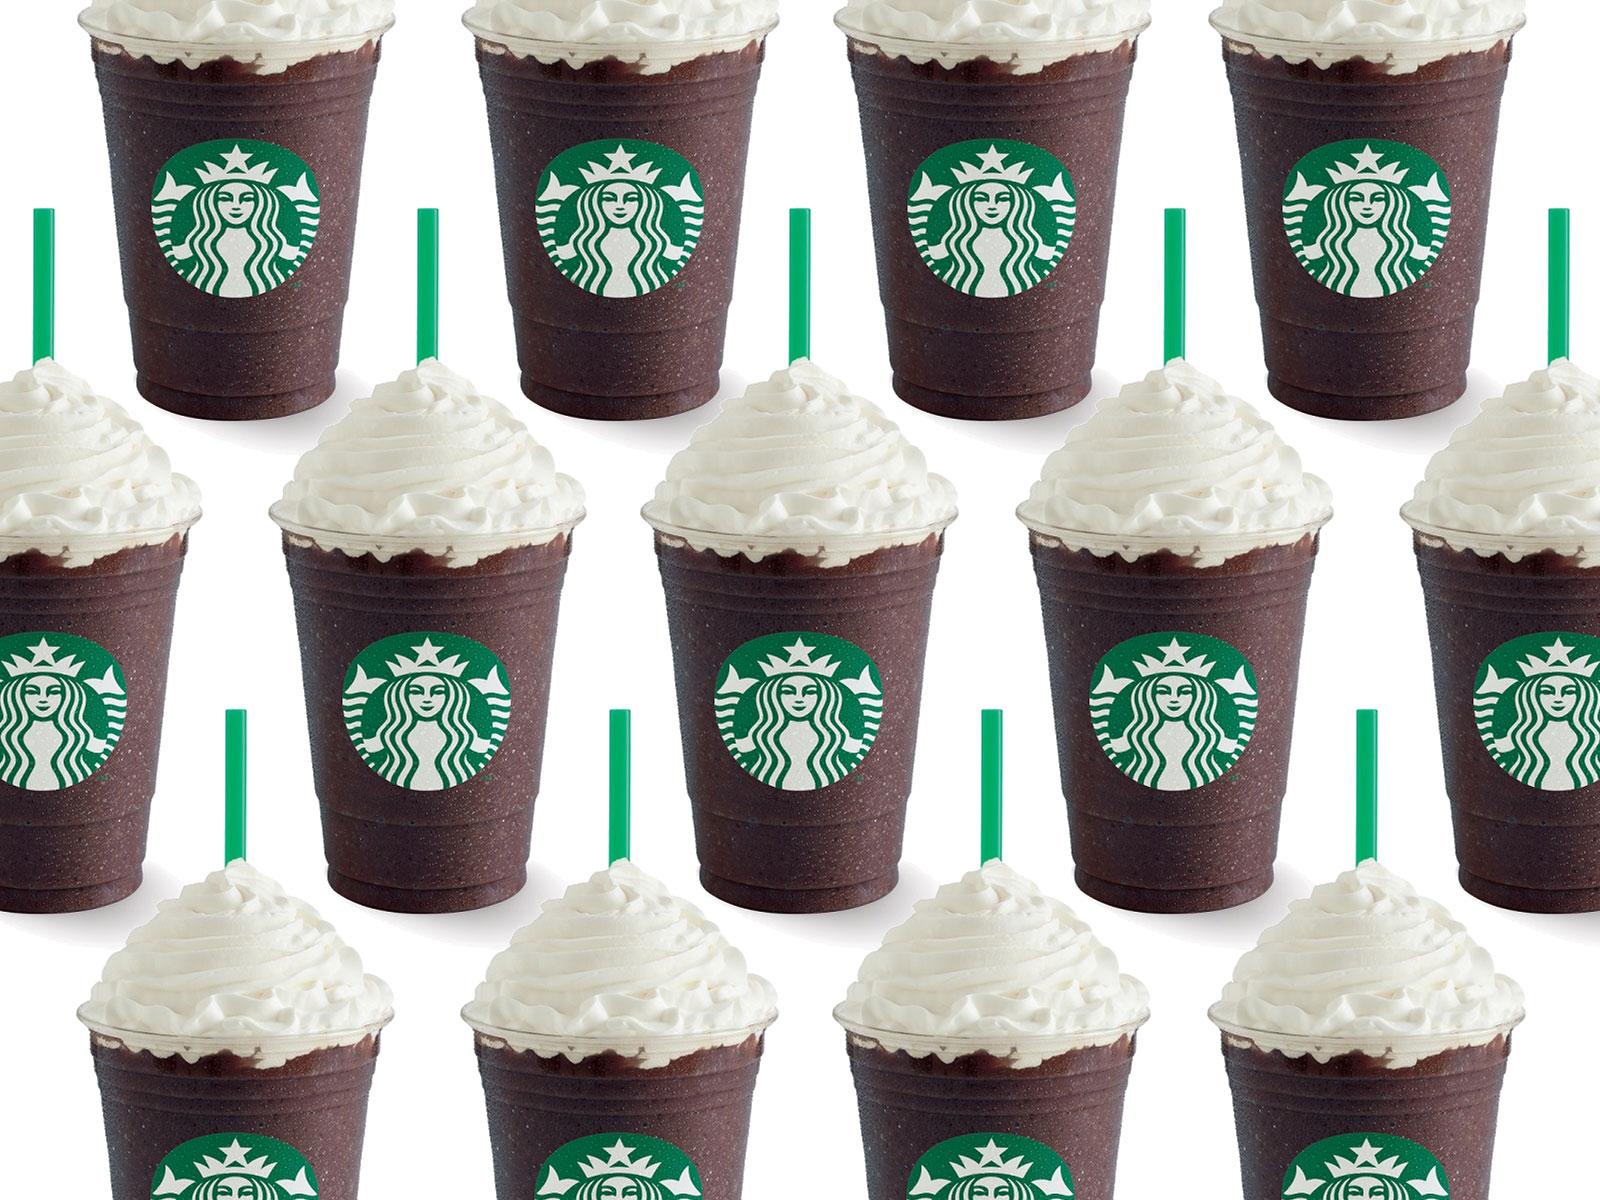 EC: Starbucks' Dark Chocolate Frappuccino Is Exclusive to Target